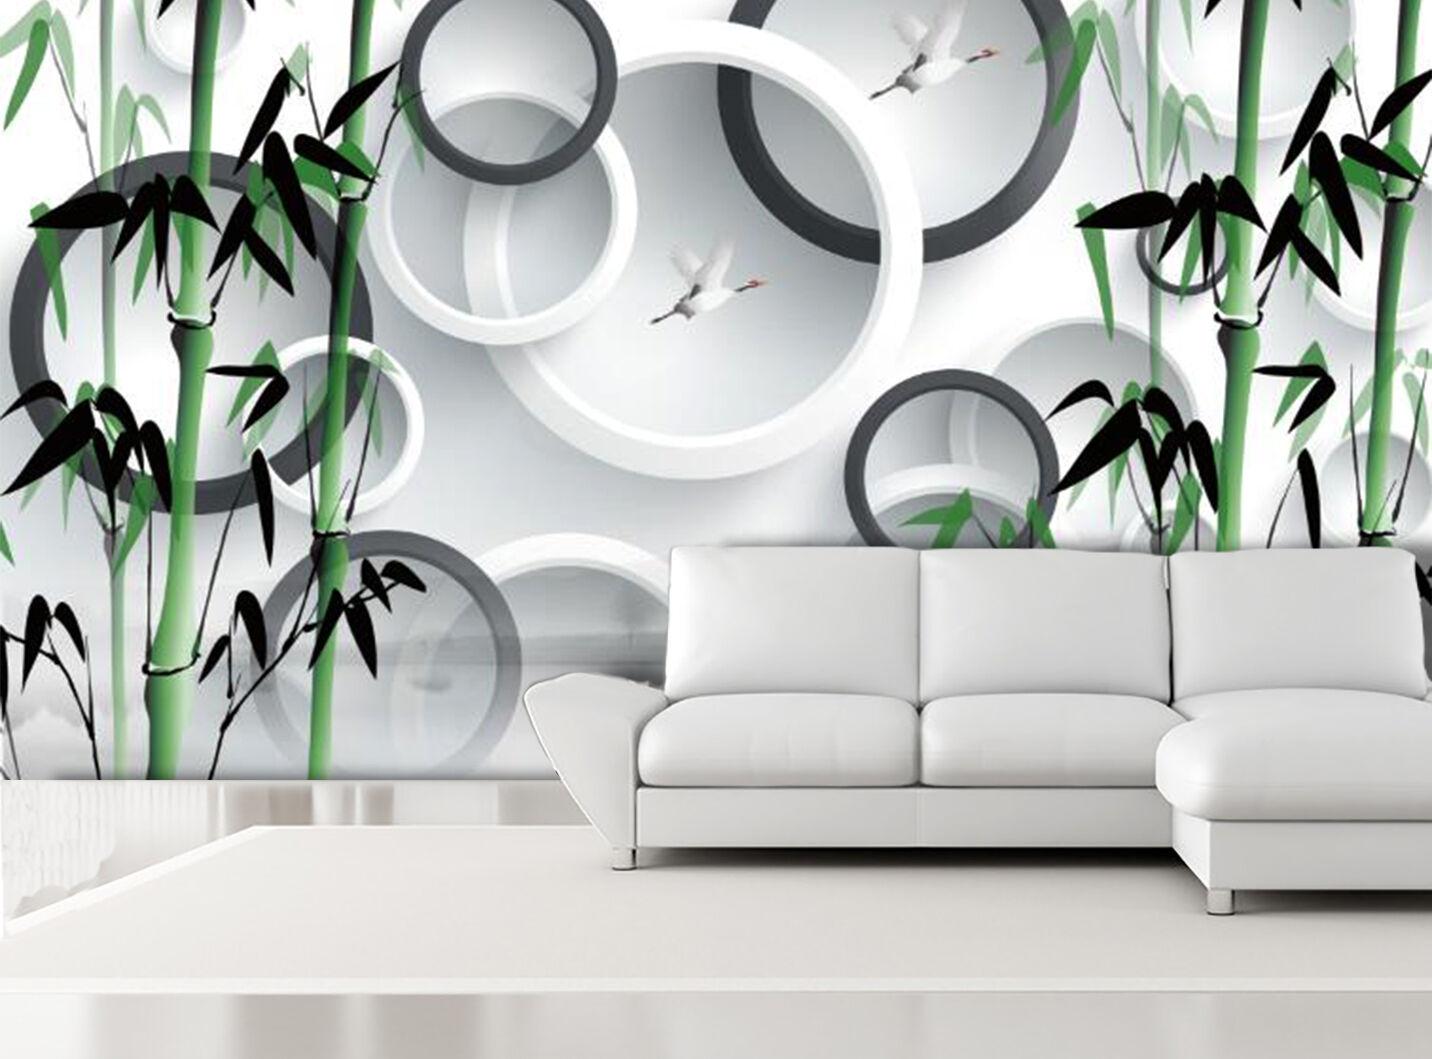 3D Bambù, rotondo Parete Murale Foto Carta da parati immagine sfondo muro stampa